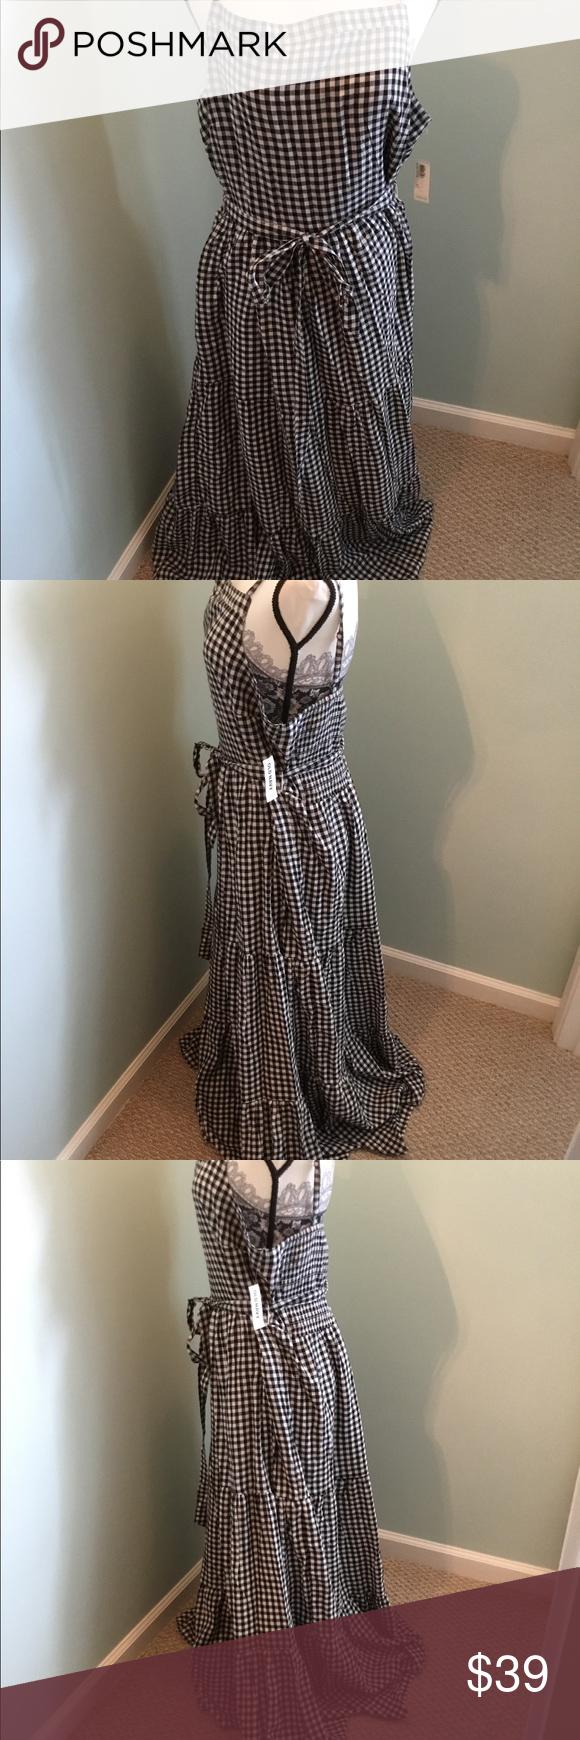 Black and white gingham maxi dress xl tall nwt gingham maxi